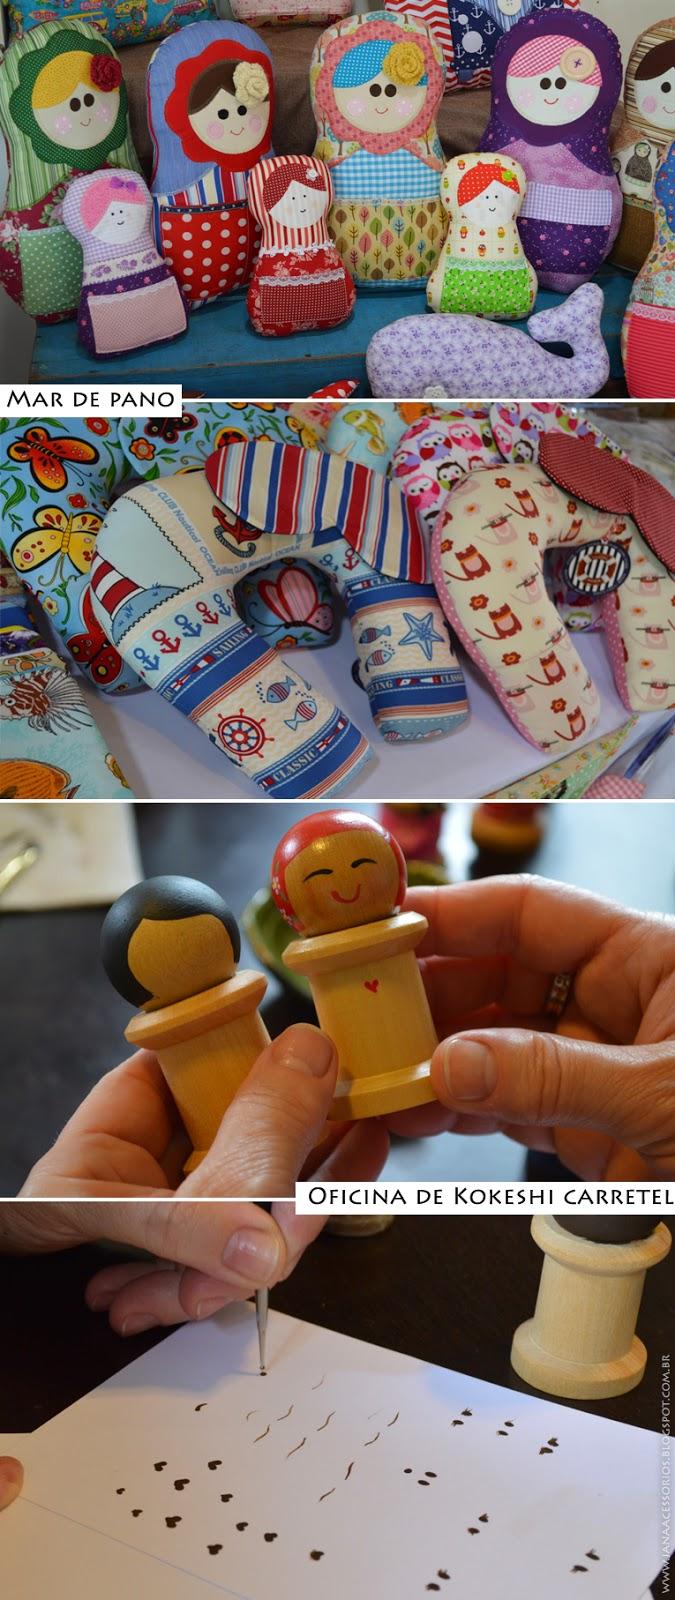 blog de acessórios, blog da jana, craft, handmade, craf ideas, ideas, joinville, Garagem Craft